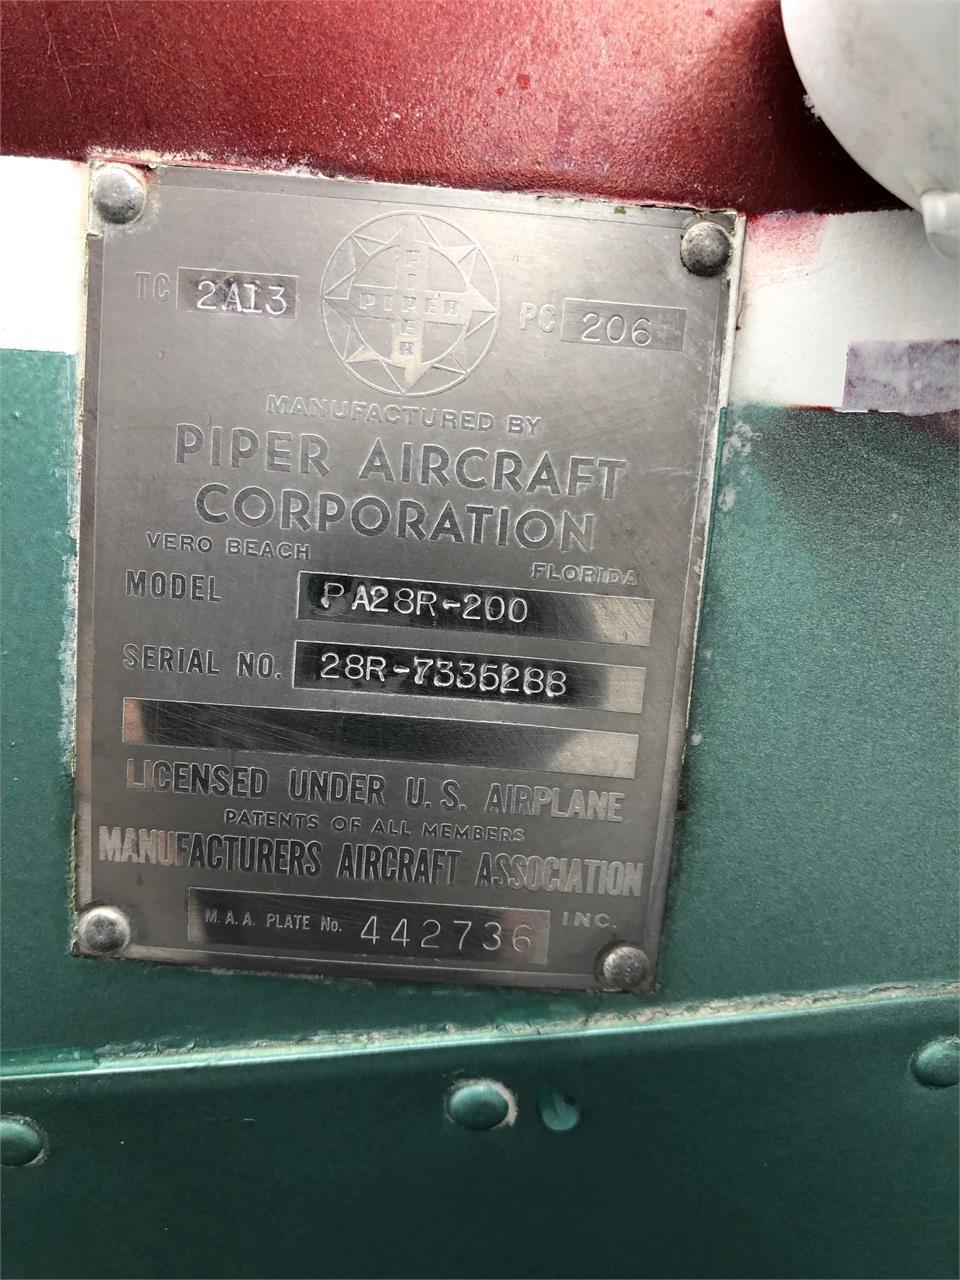 1973 PIPER ARROW II ID Plate